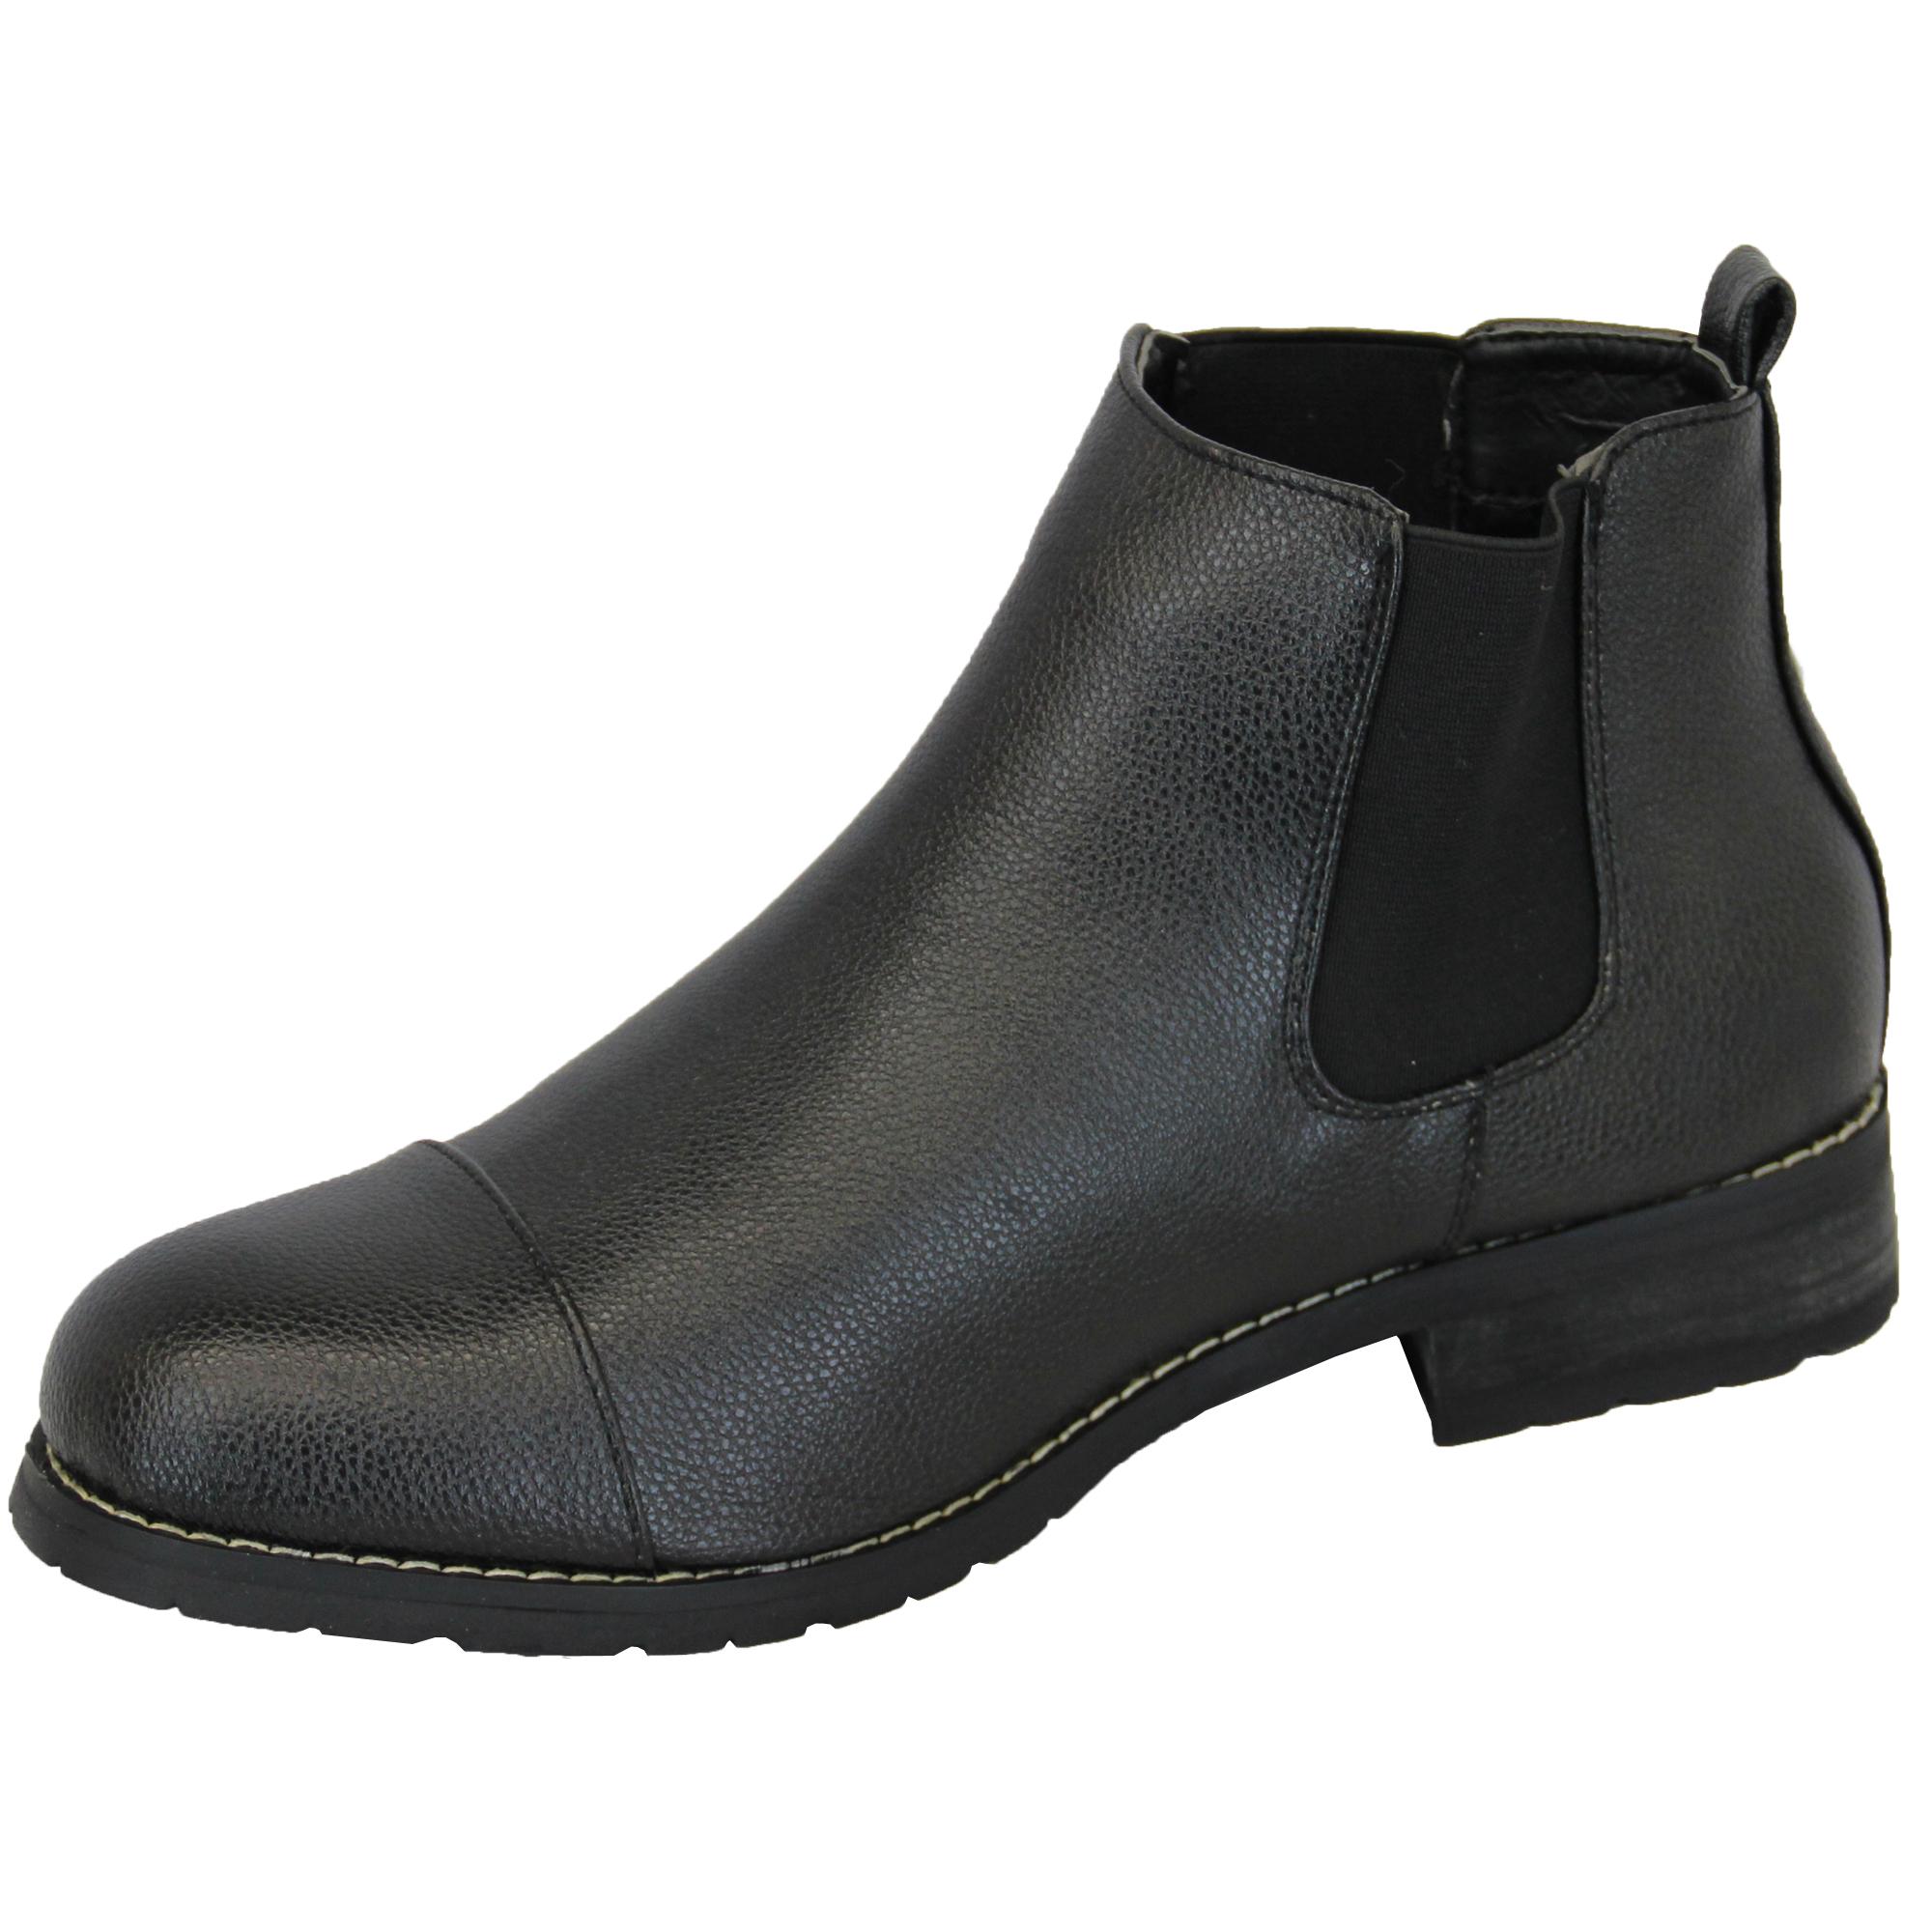 mens chelsea boots rock religion dealer high ankle